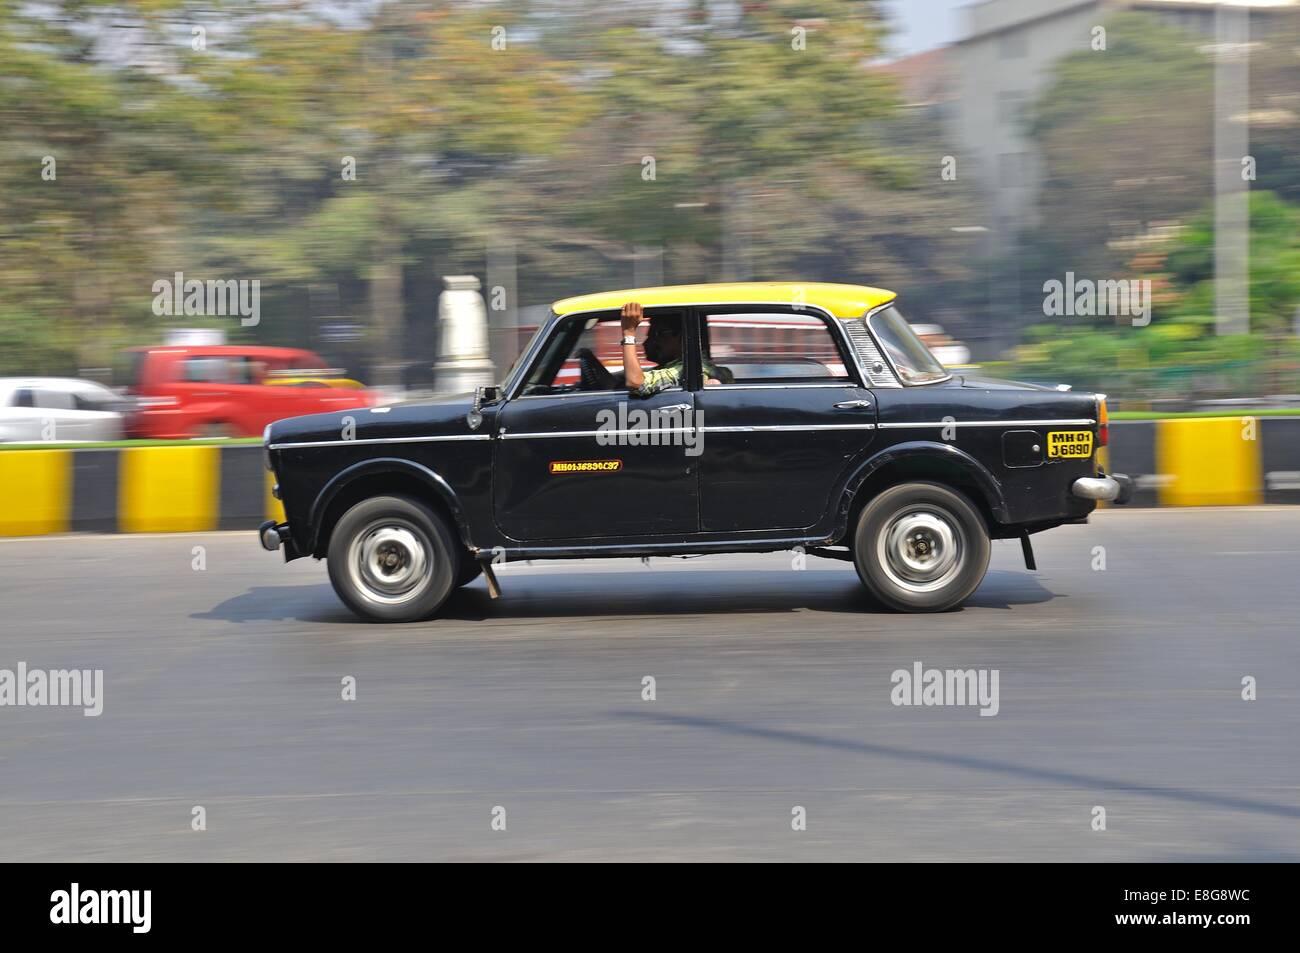 A Hindustan Ambassador Taxi driving along a city street in Mumbai, India - Stock Image